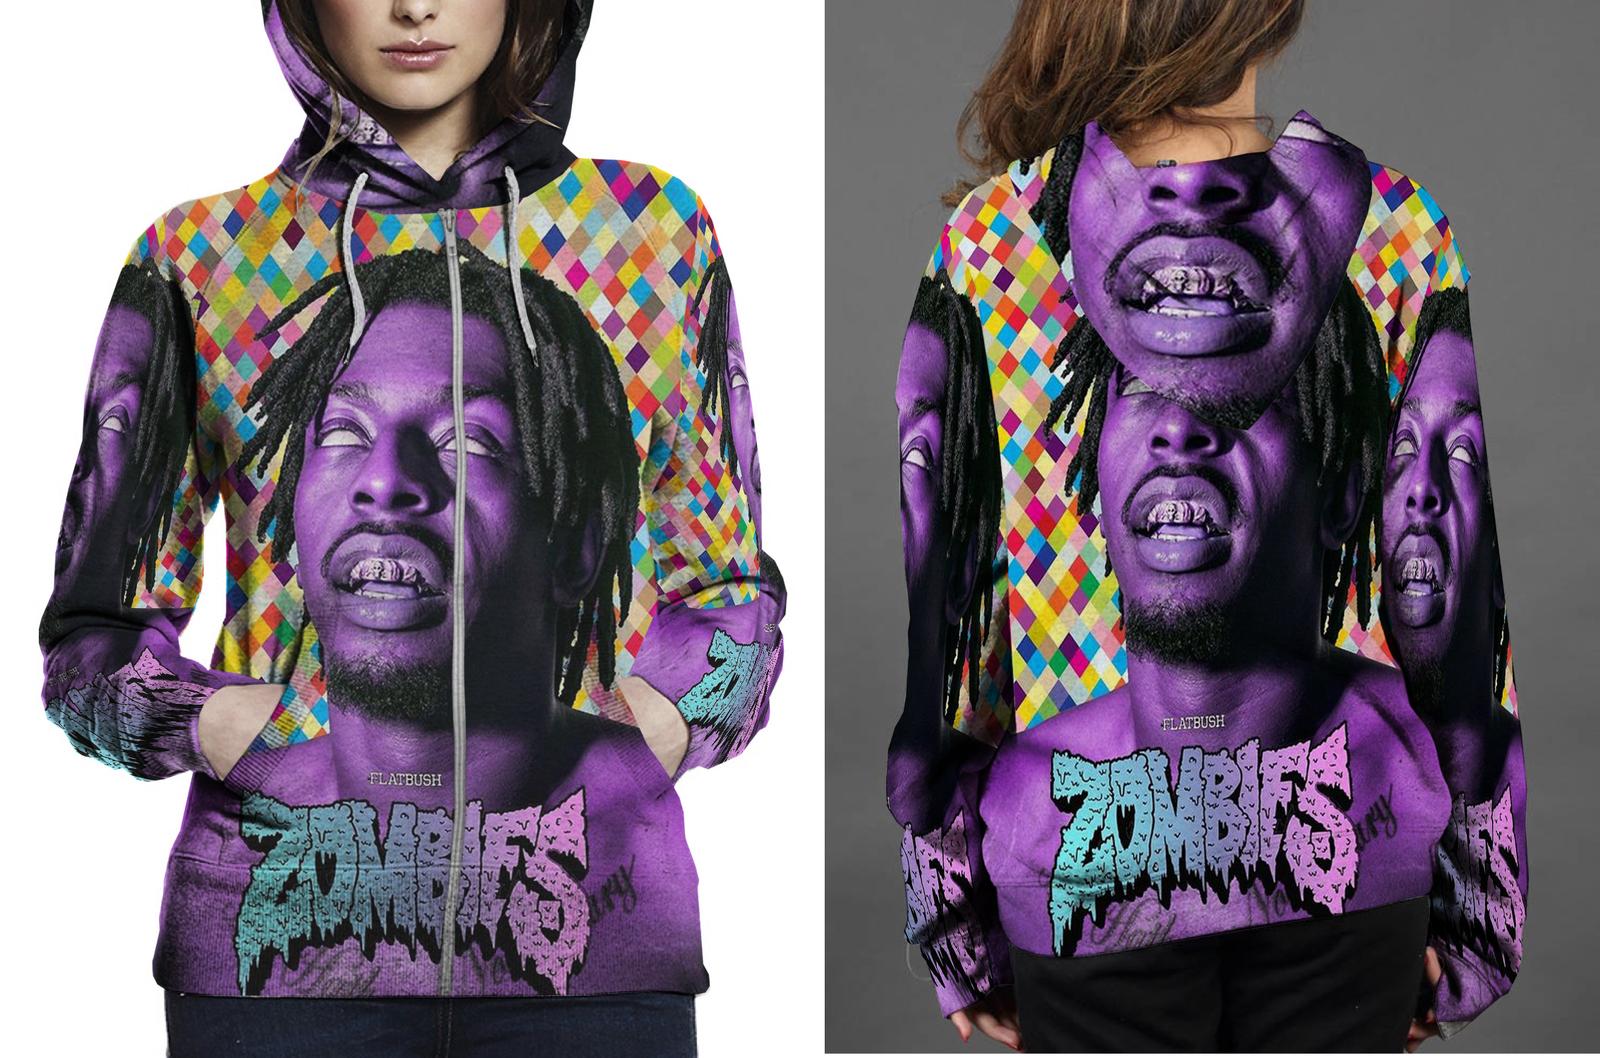 Flatbush zombies hoodie zipper fullprint for women